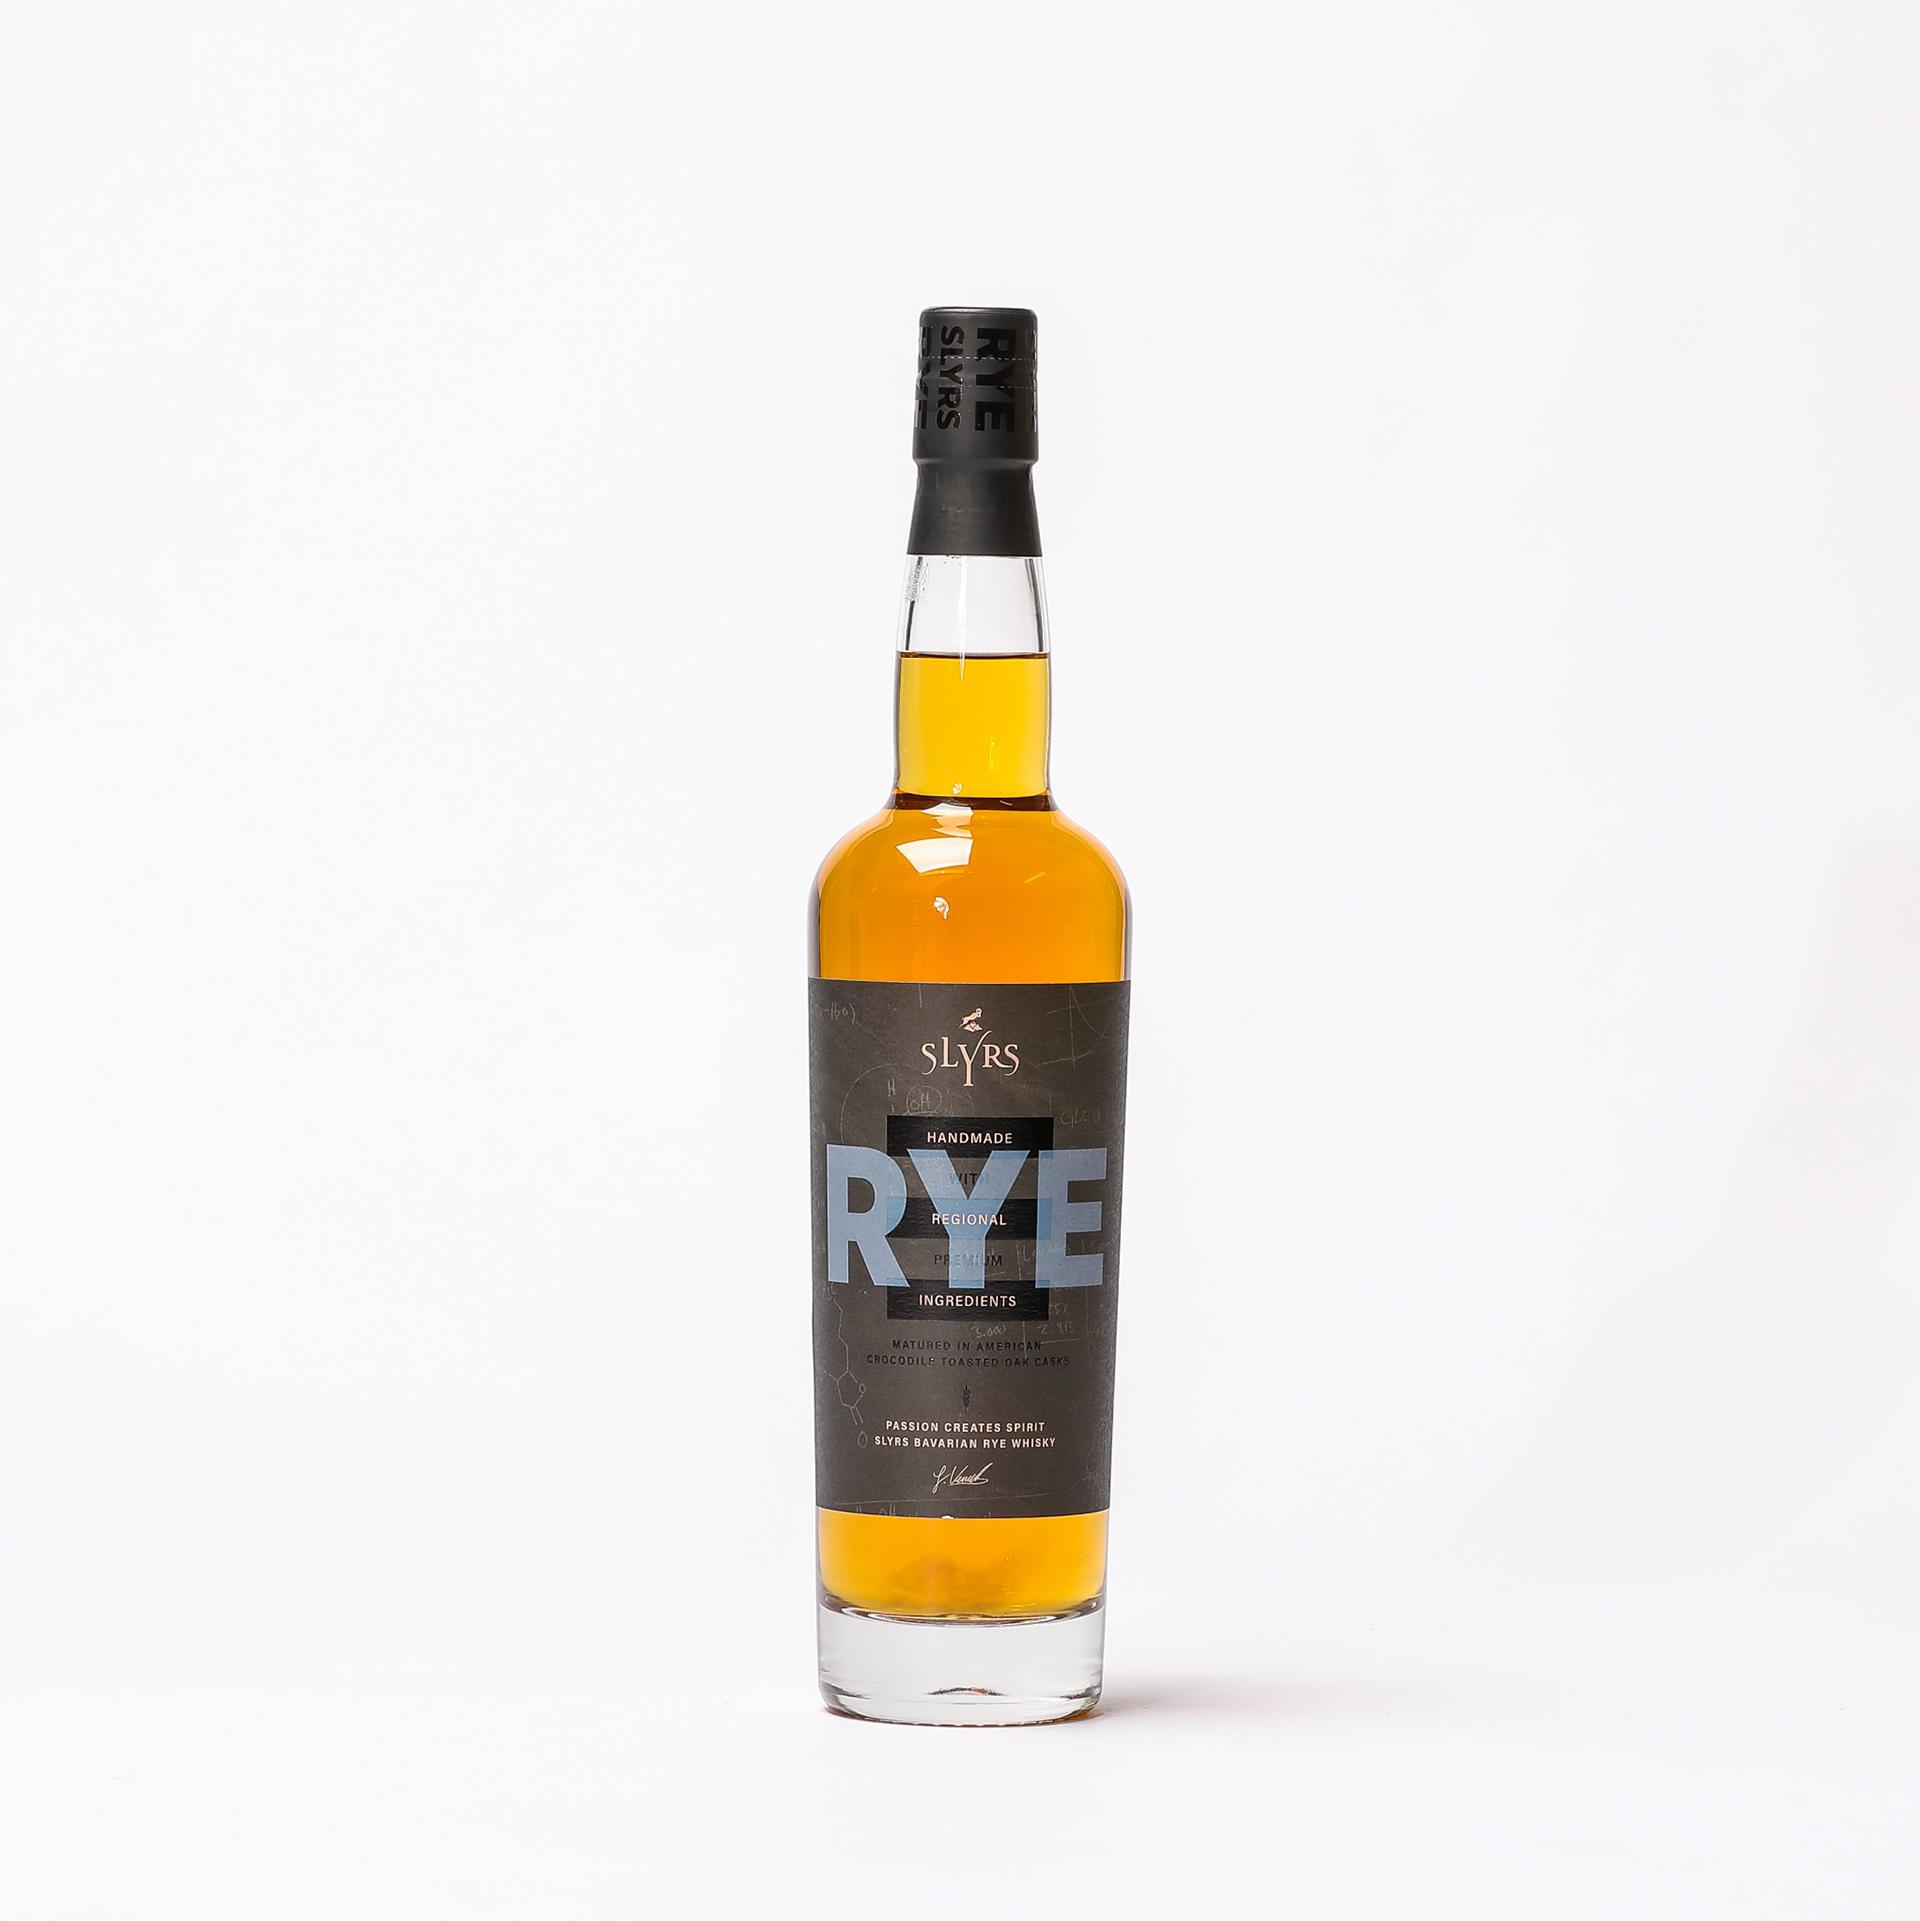 Produktbild Bavarian RYE Whisky 0,7l 41% vol. - Slyrs Destillerie| DINZLER Kaffeerösterei